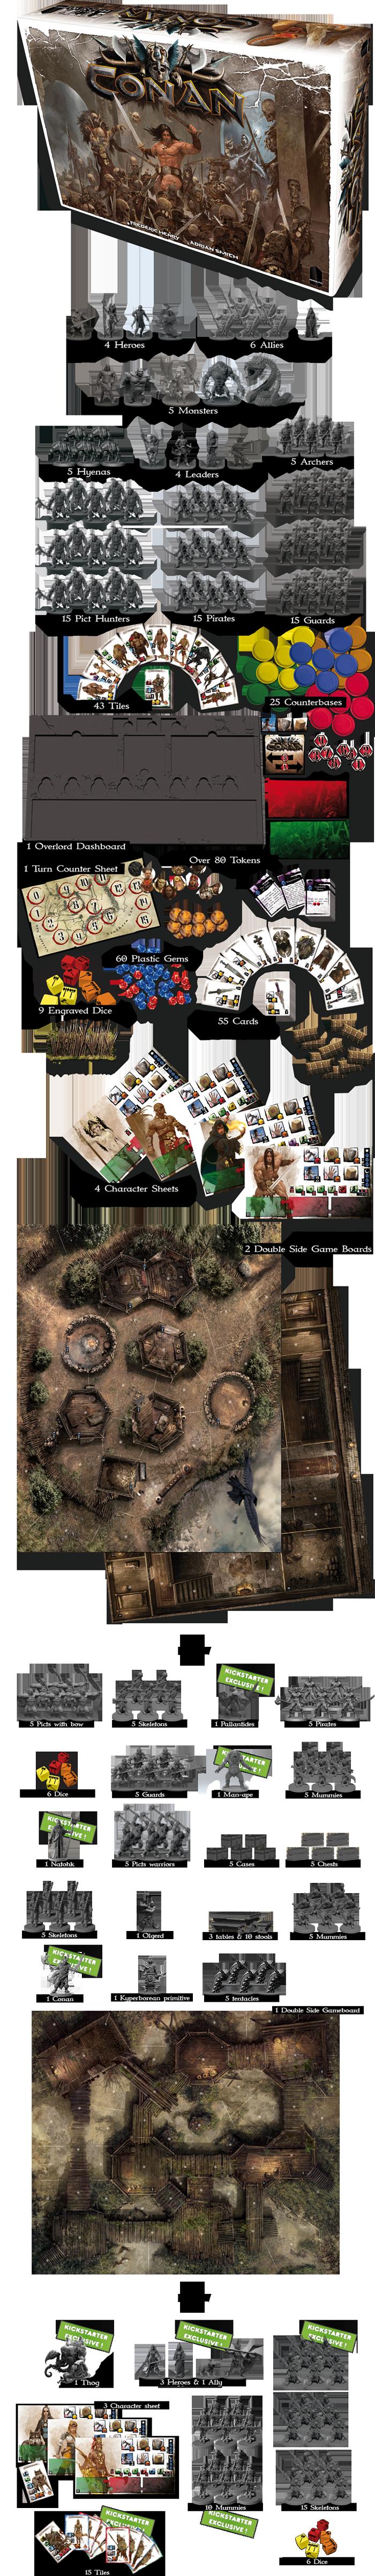 Conan the board game C761e5fc327fe2261bfde382d80e9c36_large